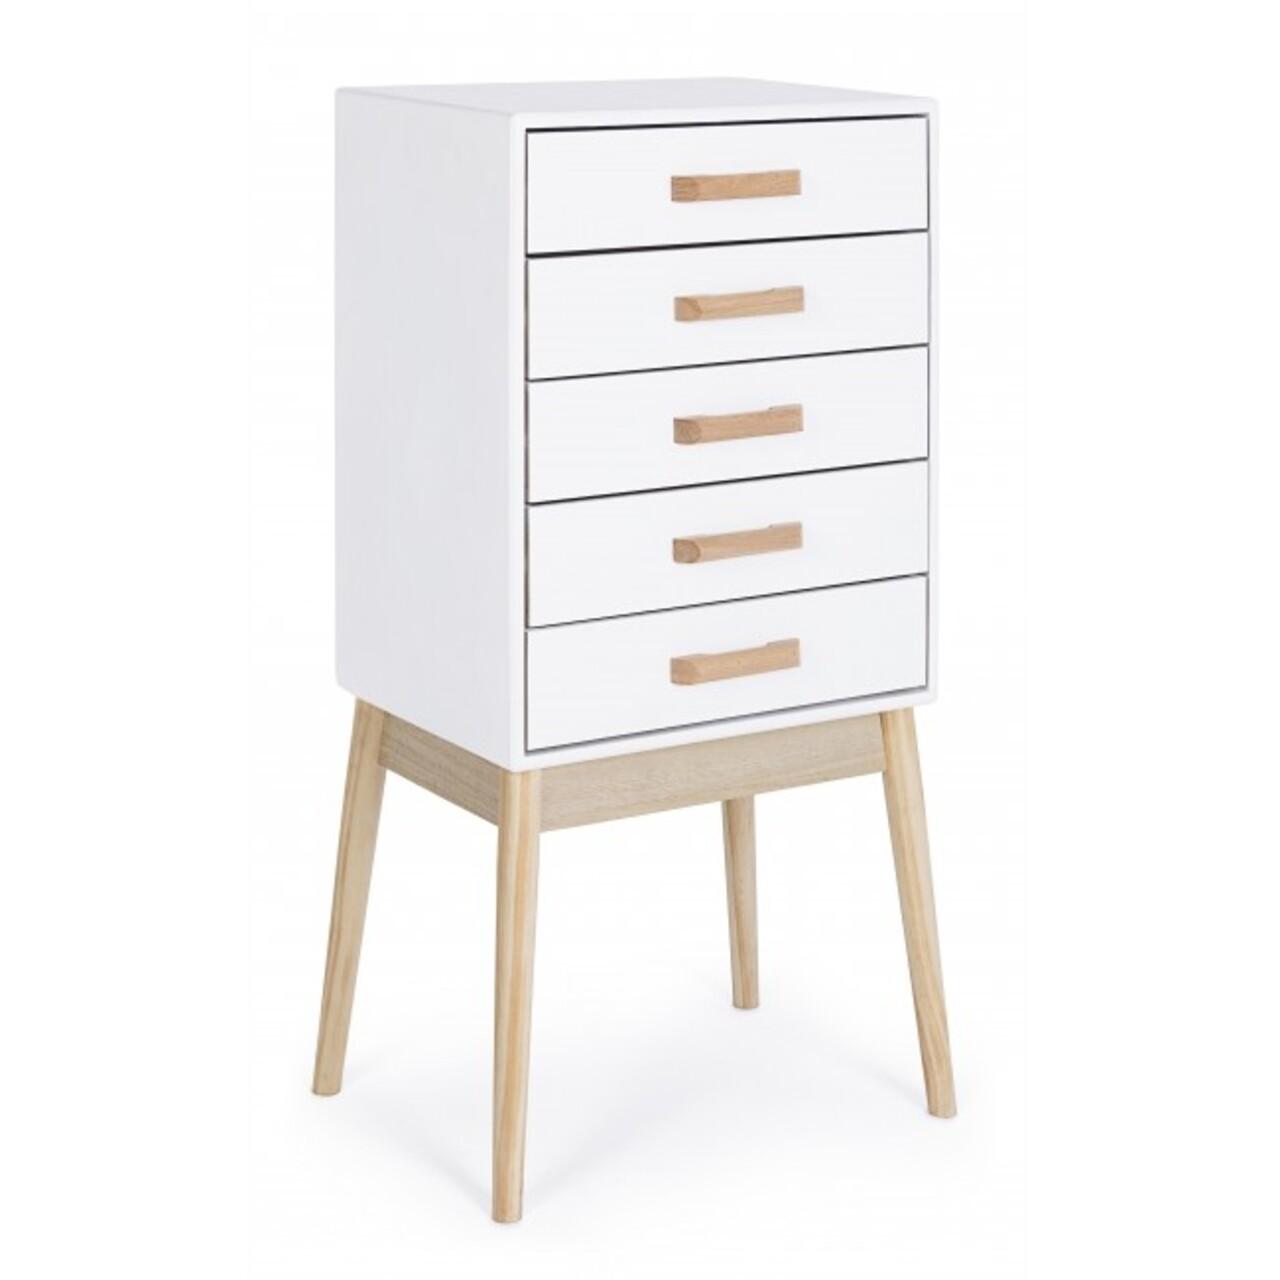 Comoda cu 5 sertare, Ordinary, Bizzotto, 43x30x88 cm, lemn de pin